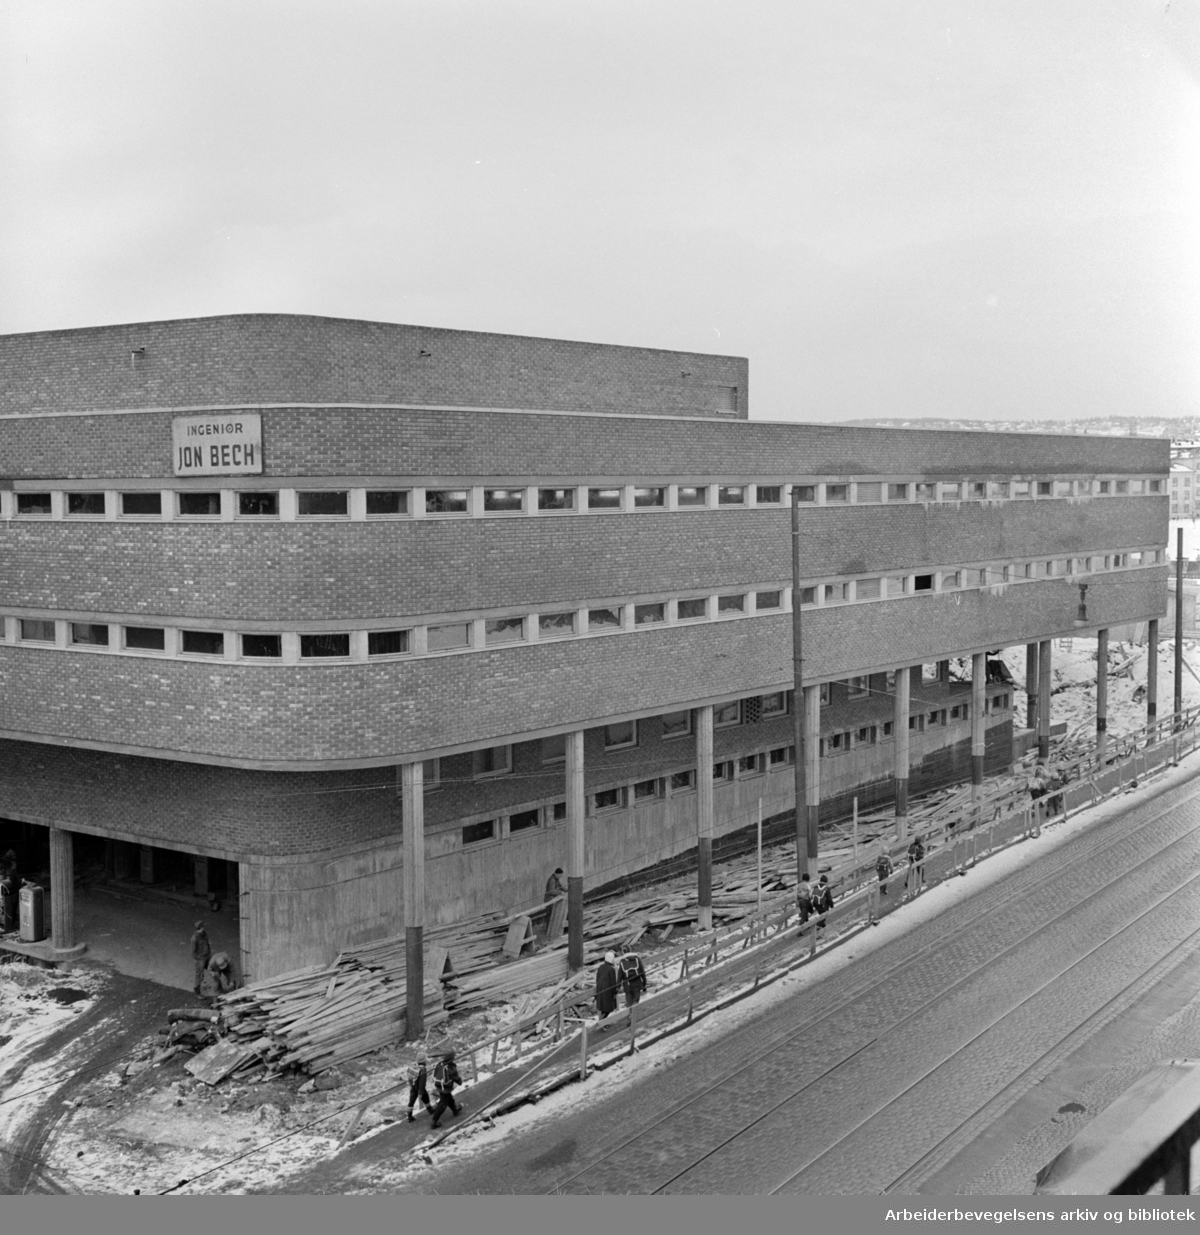 Trondheimsveien: Garasjeanlegget på Sinsen, snart ferdig. 11. mars 1958.